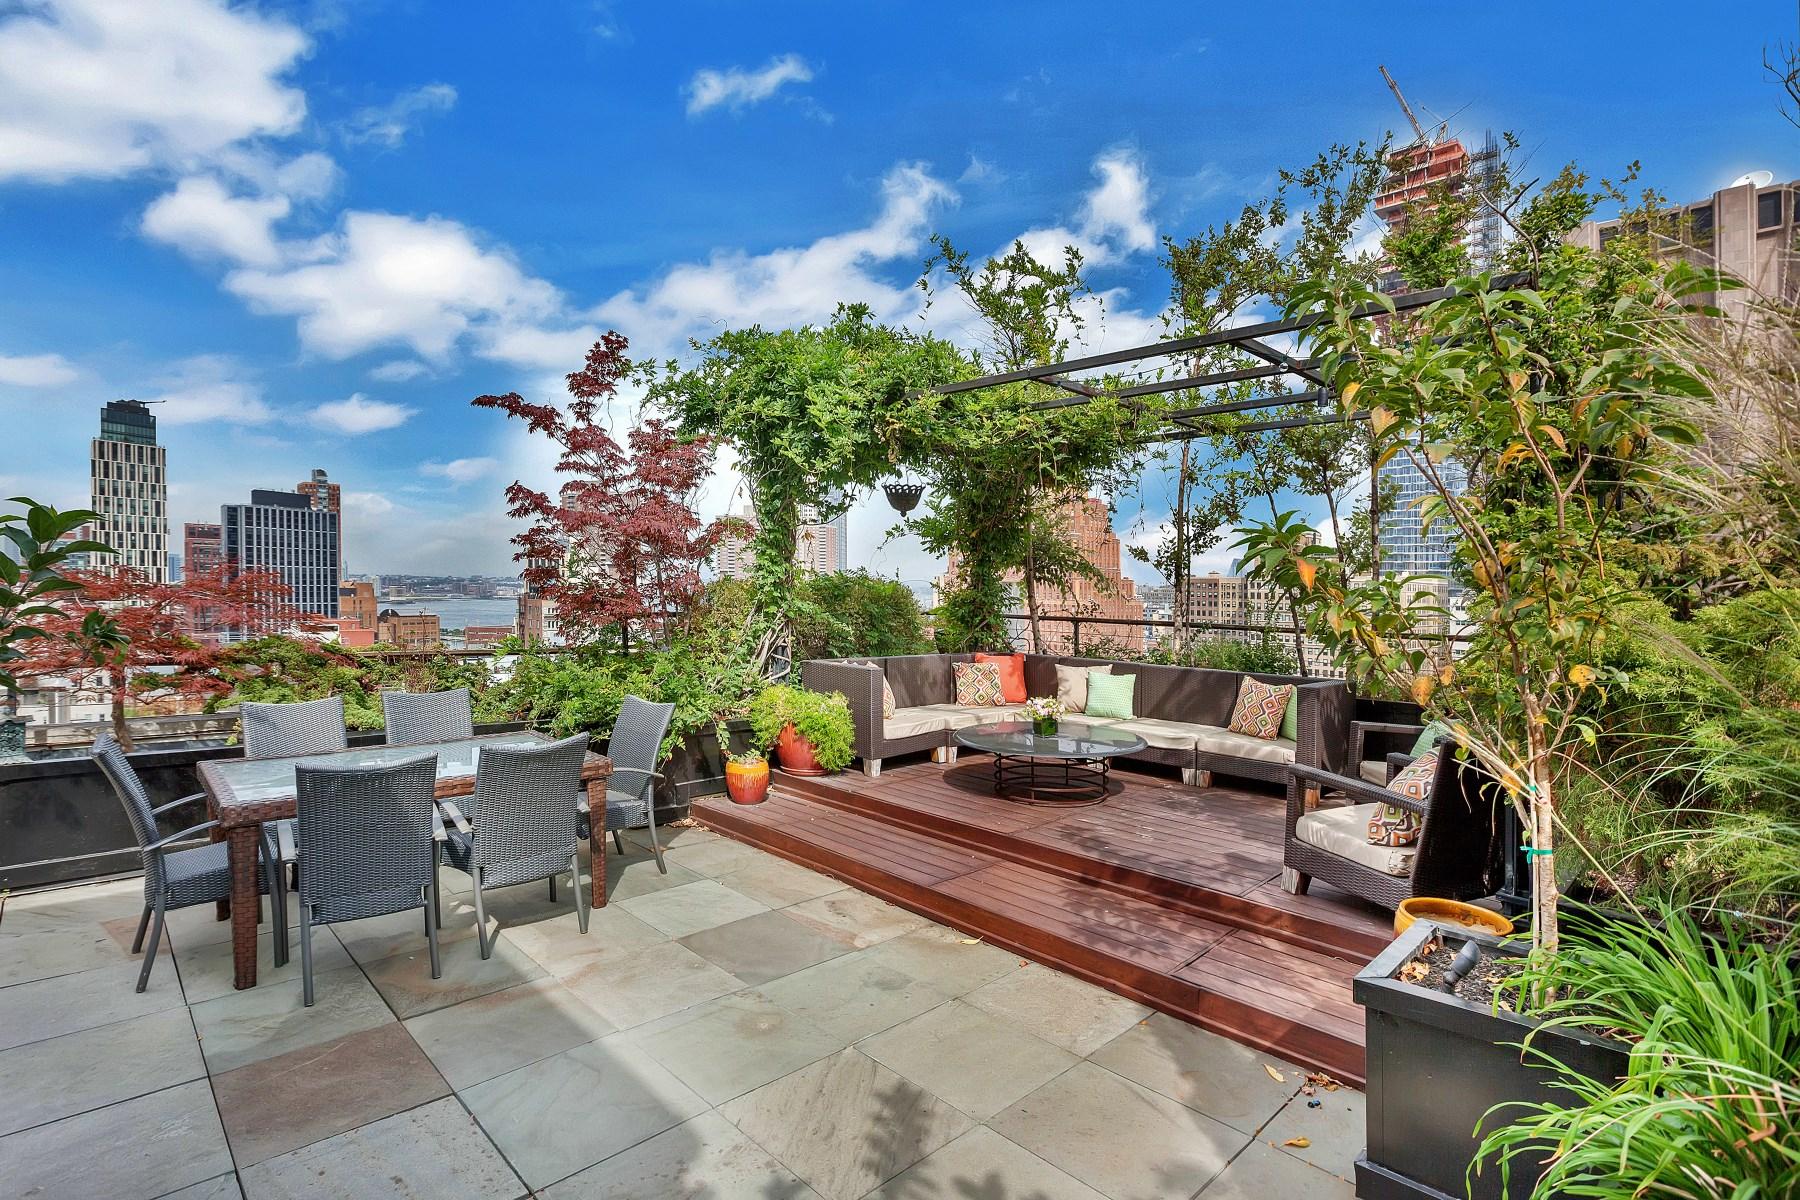 Condominium for Sale at 9 Murray Street, PH-12SW 9 Murray Street Apt PH-12SW Tribeca, New York, New York, 10007 United States